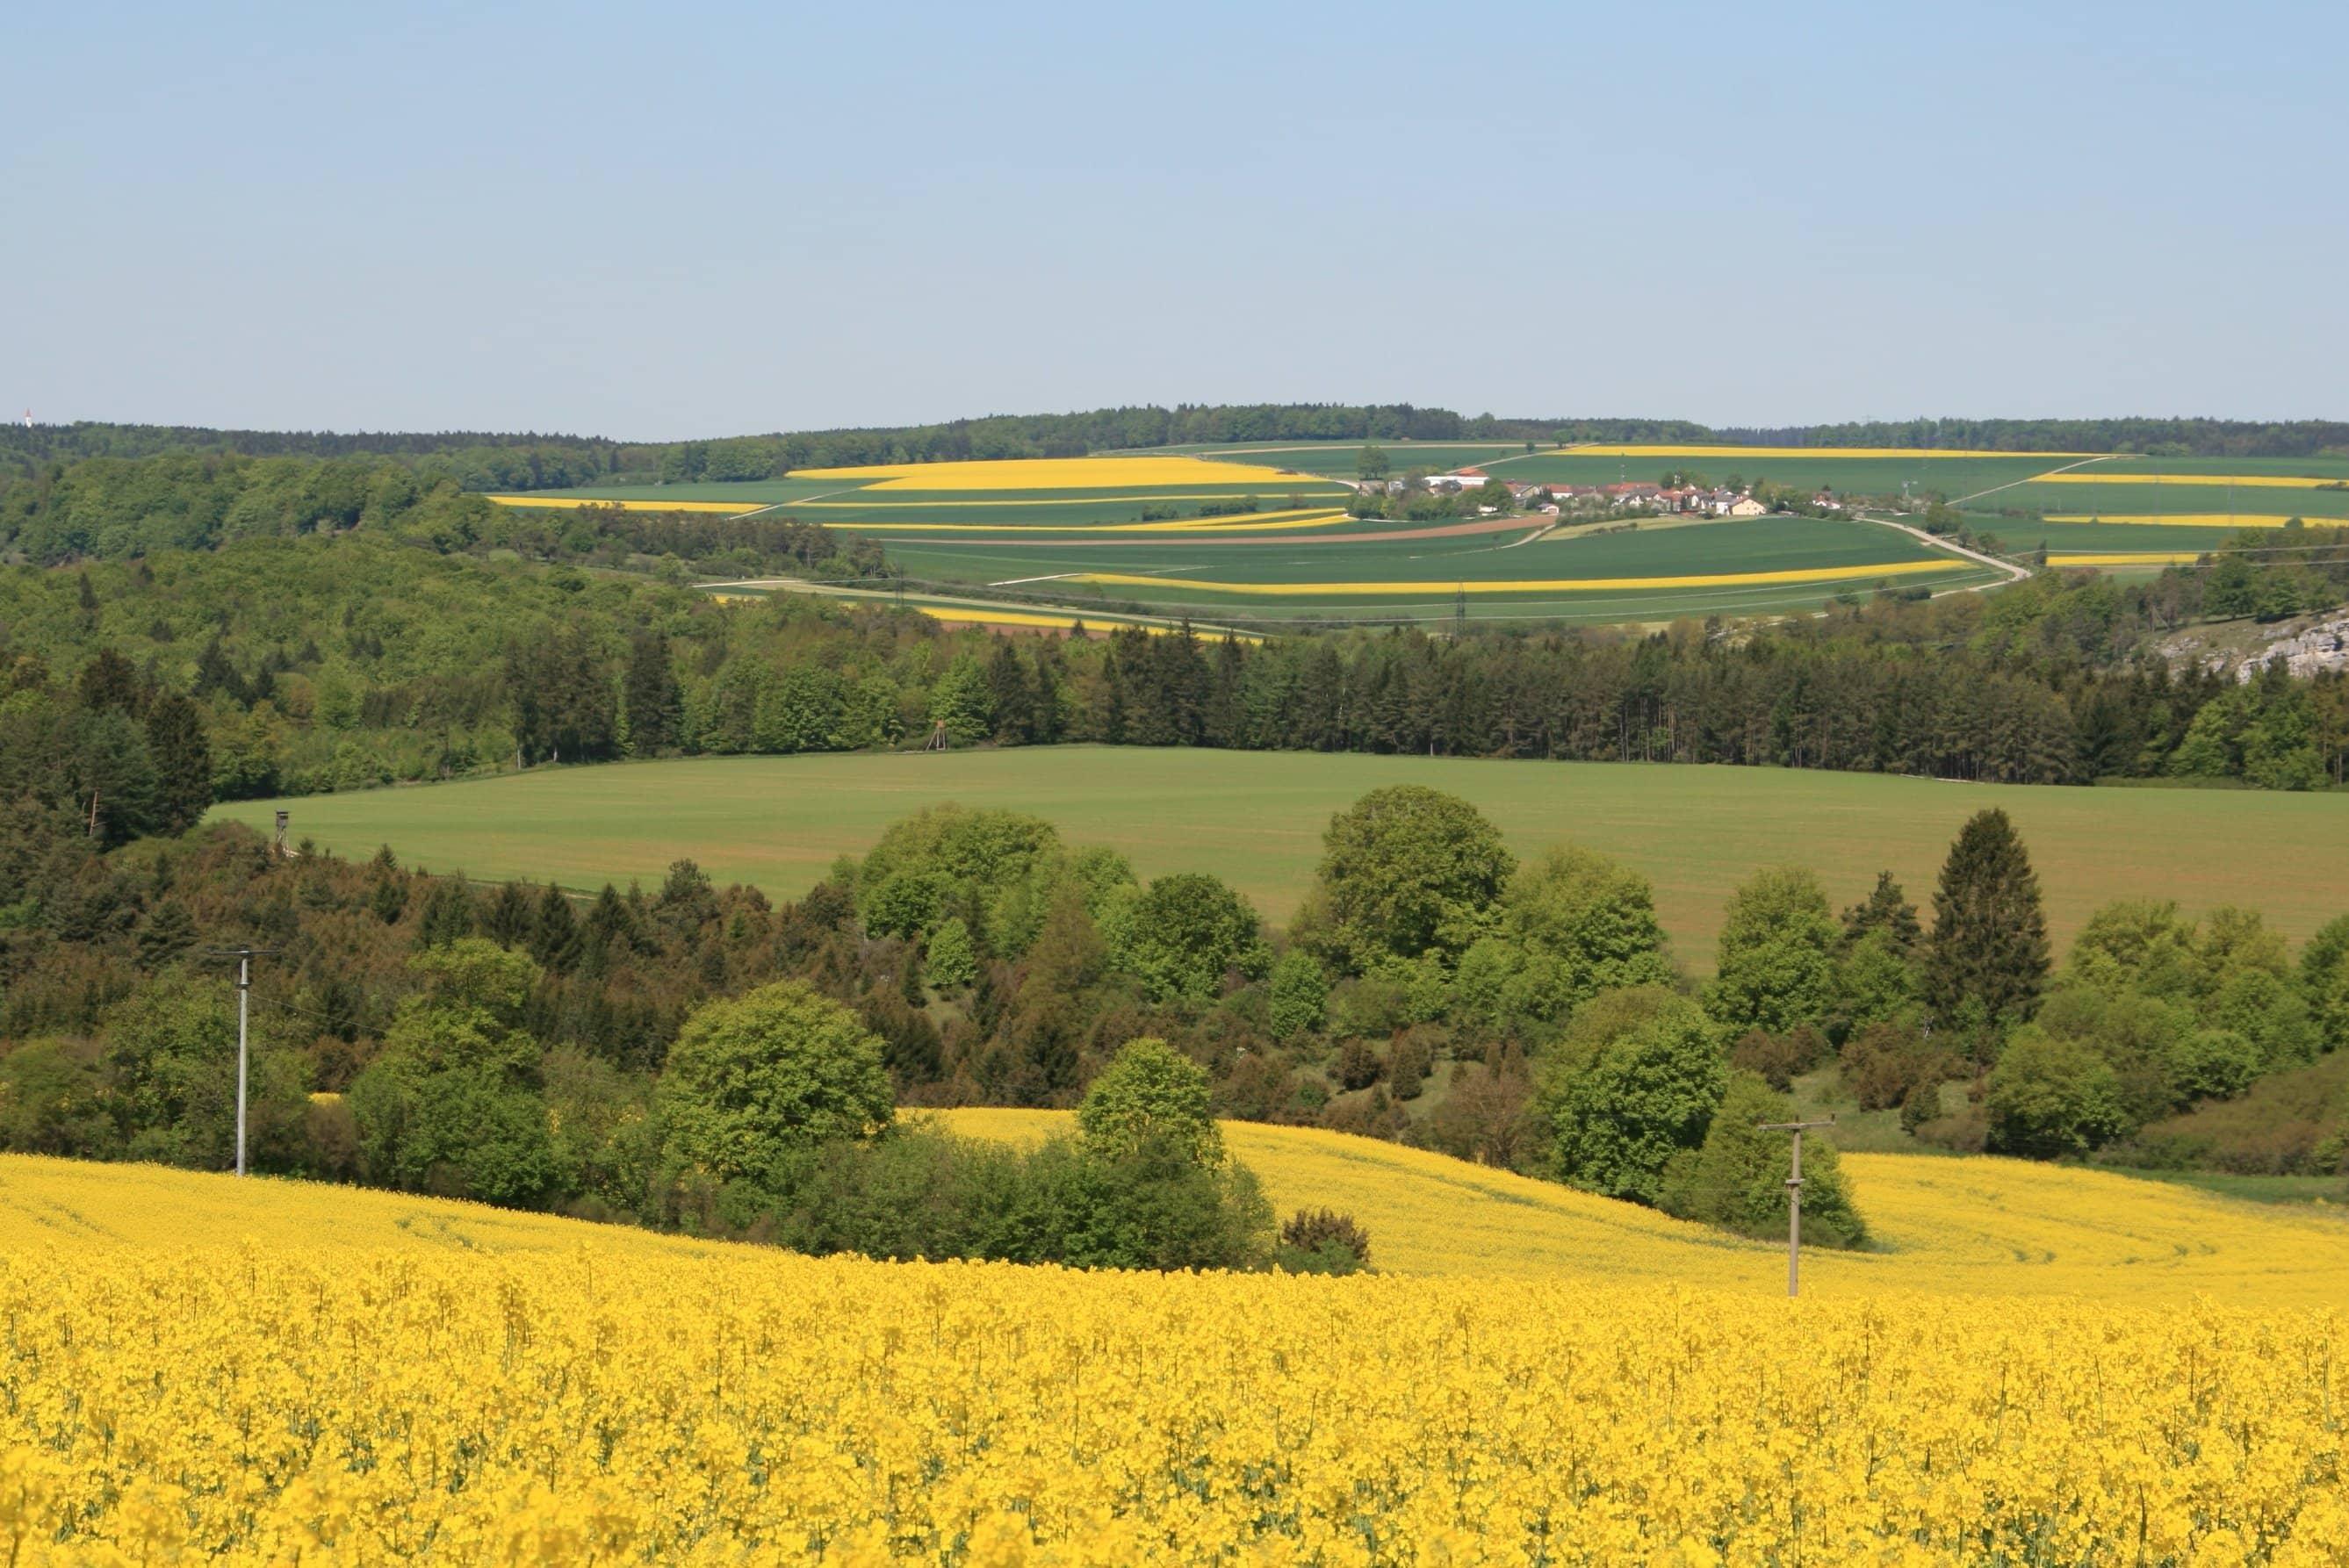 Gambar Gratis Lanskap Langit Bidang Pertanian Bukit Pedesaan